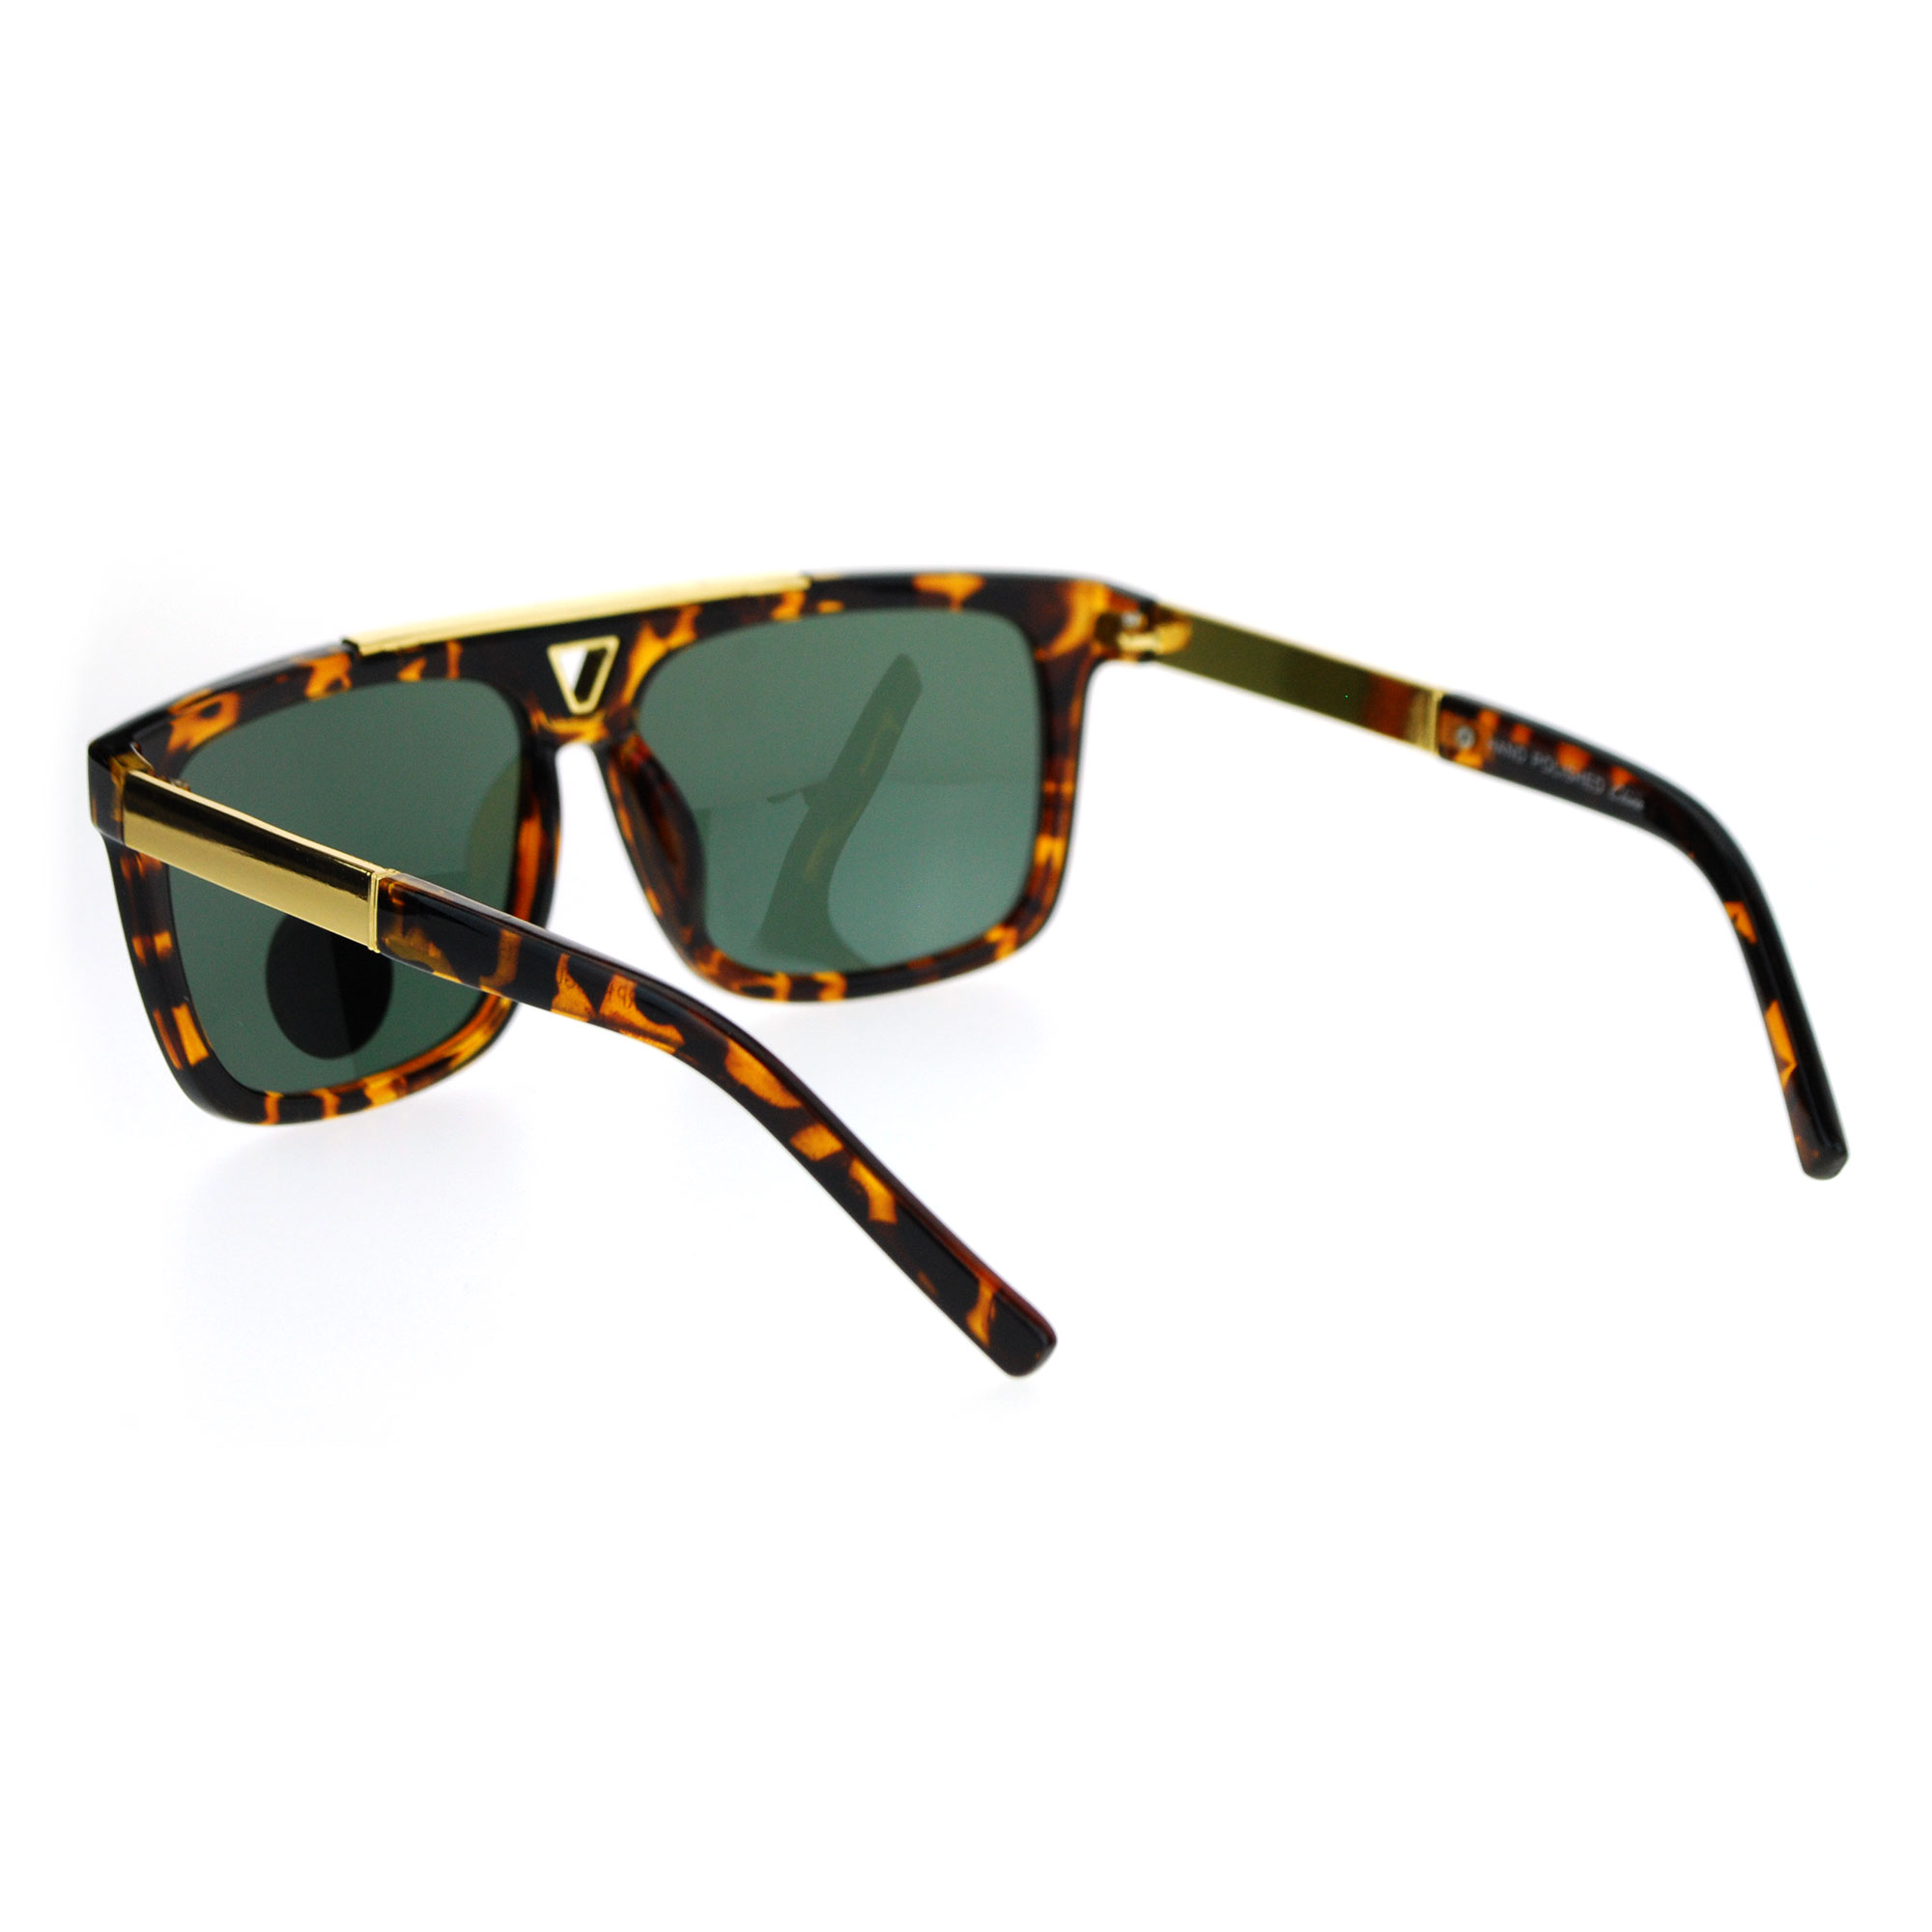 c9d31dfa8cd SA106 - SA106 Mens Tempered Glass Lens Mobster Mafia Flat Top Luxury  Gangster Sunglasses Black - Walmart.com